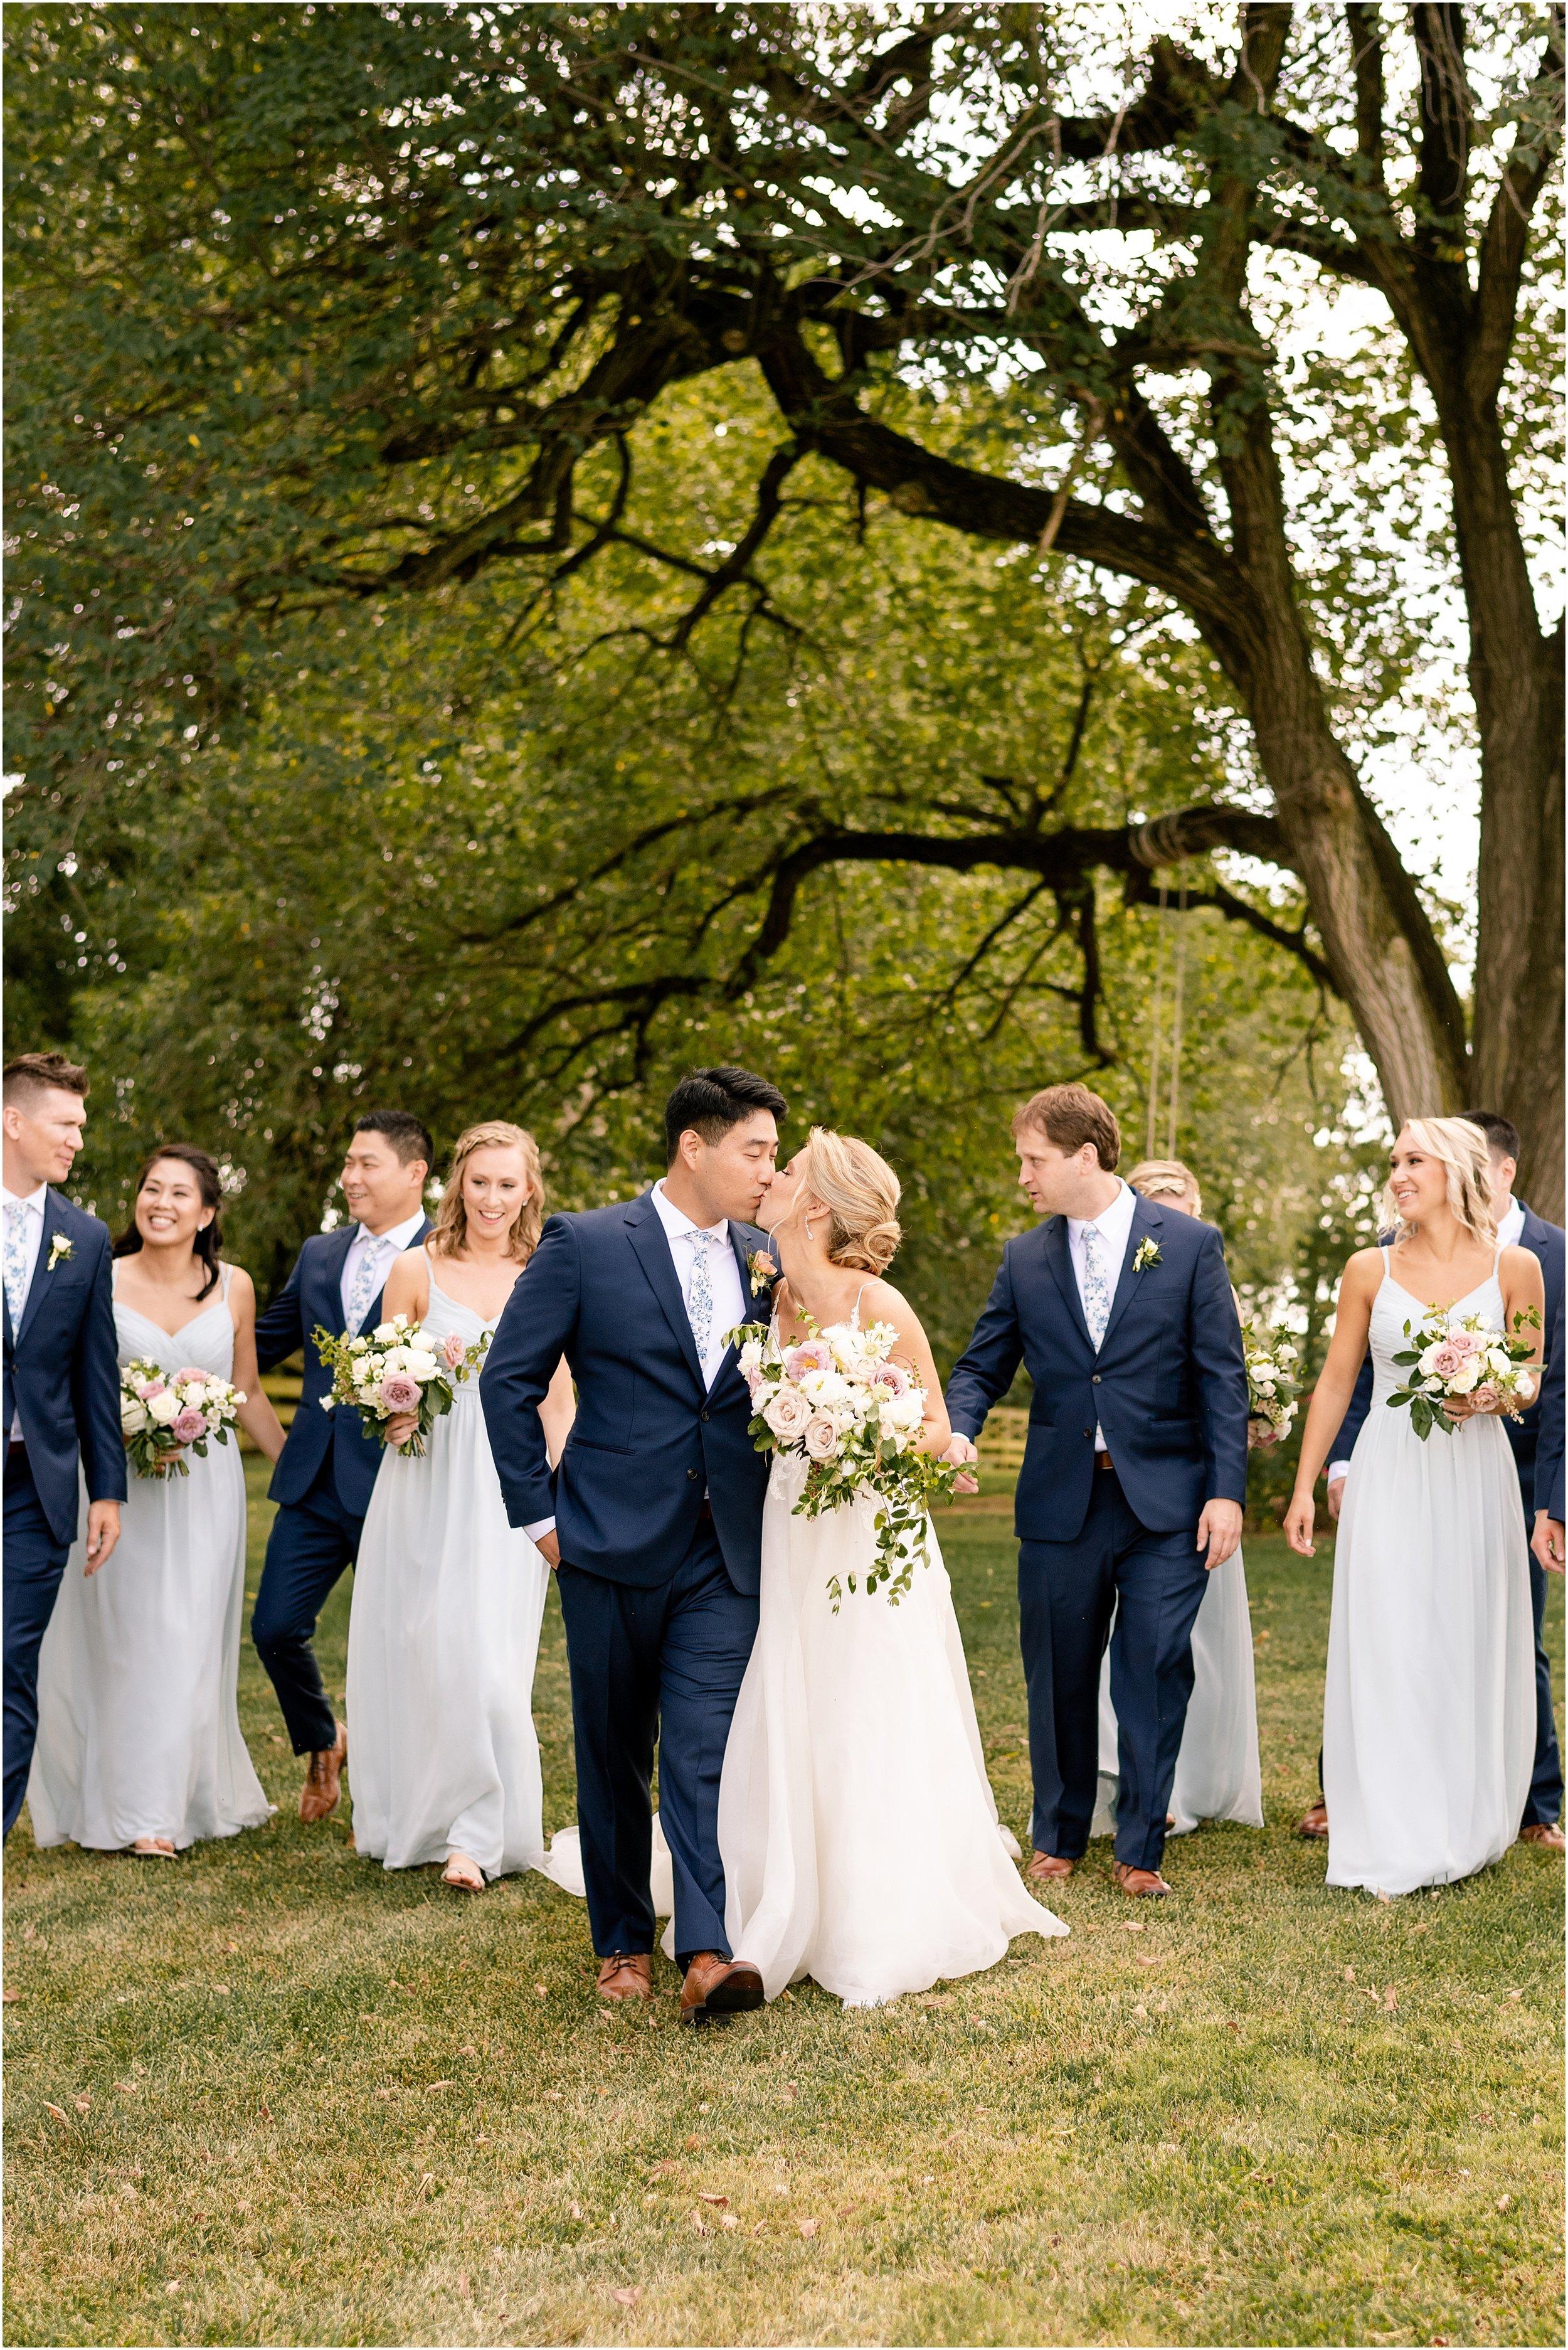 hannah leigh photography Walkers Overlook Wedding Walkersville MD_3518.jpg